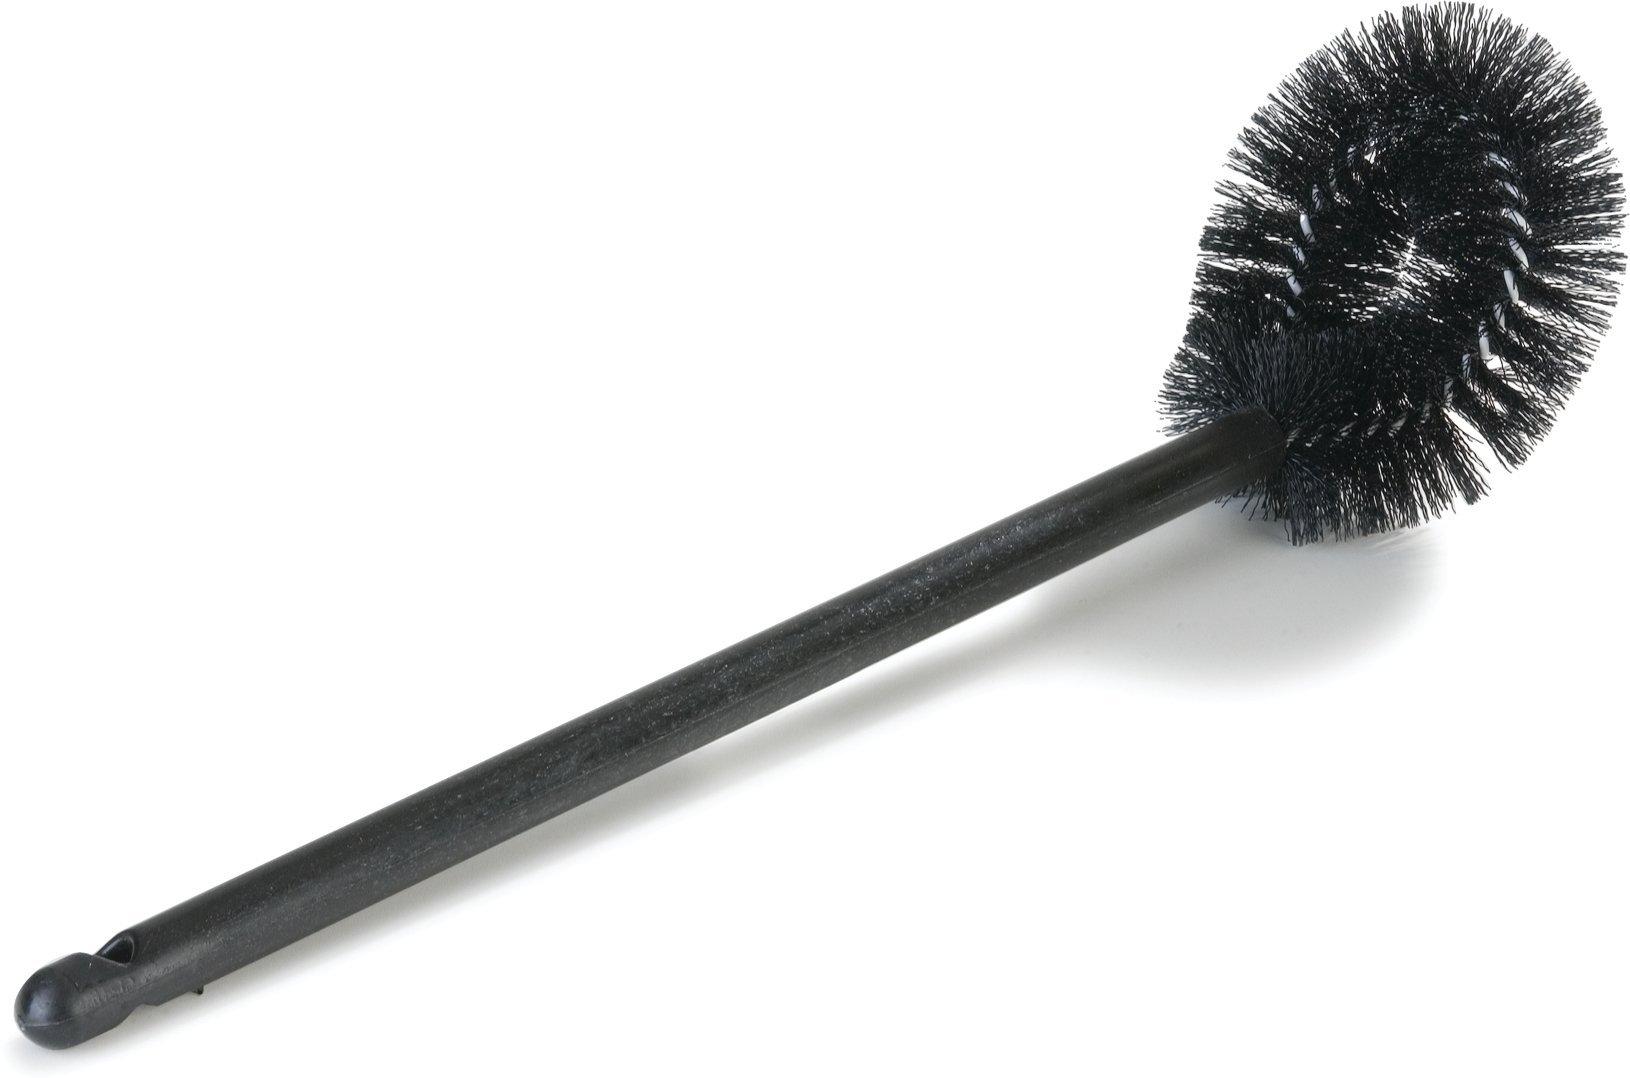 Carlisle 3631303 Plastic Handle Bowl Brush, Nylon Bristles, 5-1/2'' Length x 4-1/2 Width Brush, 20'' Length, Black (Case of 24)